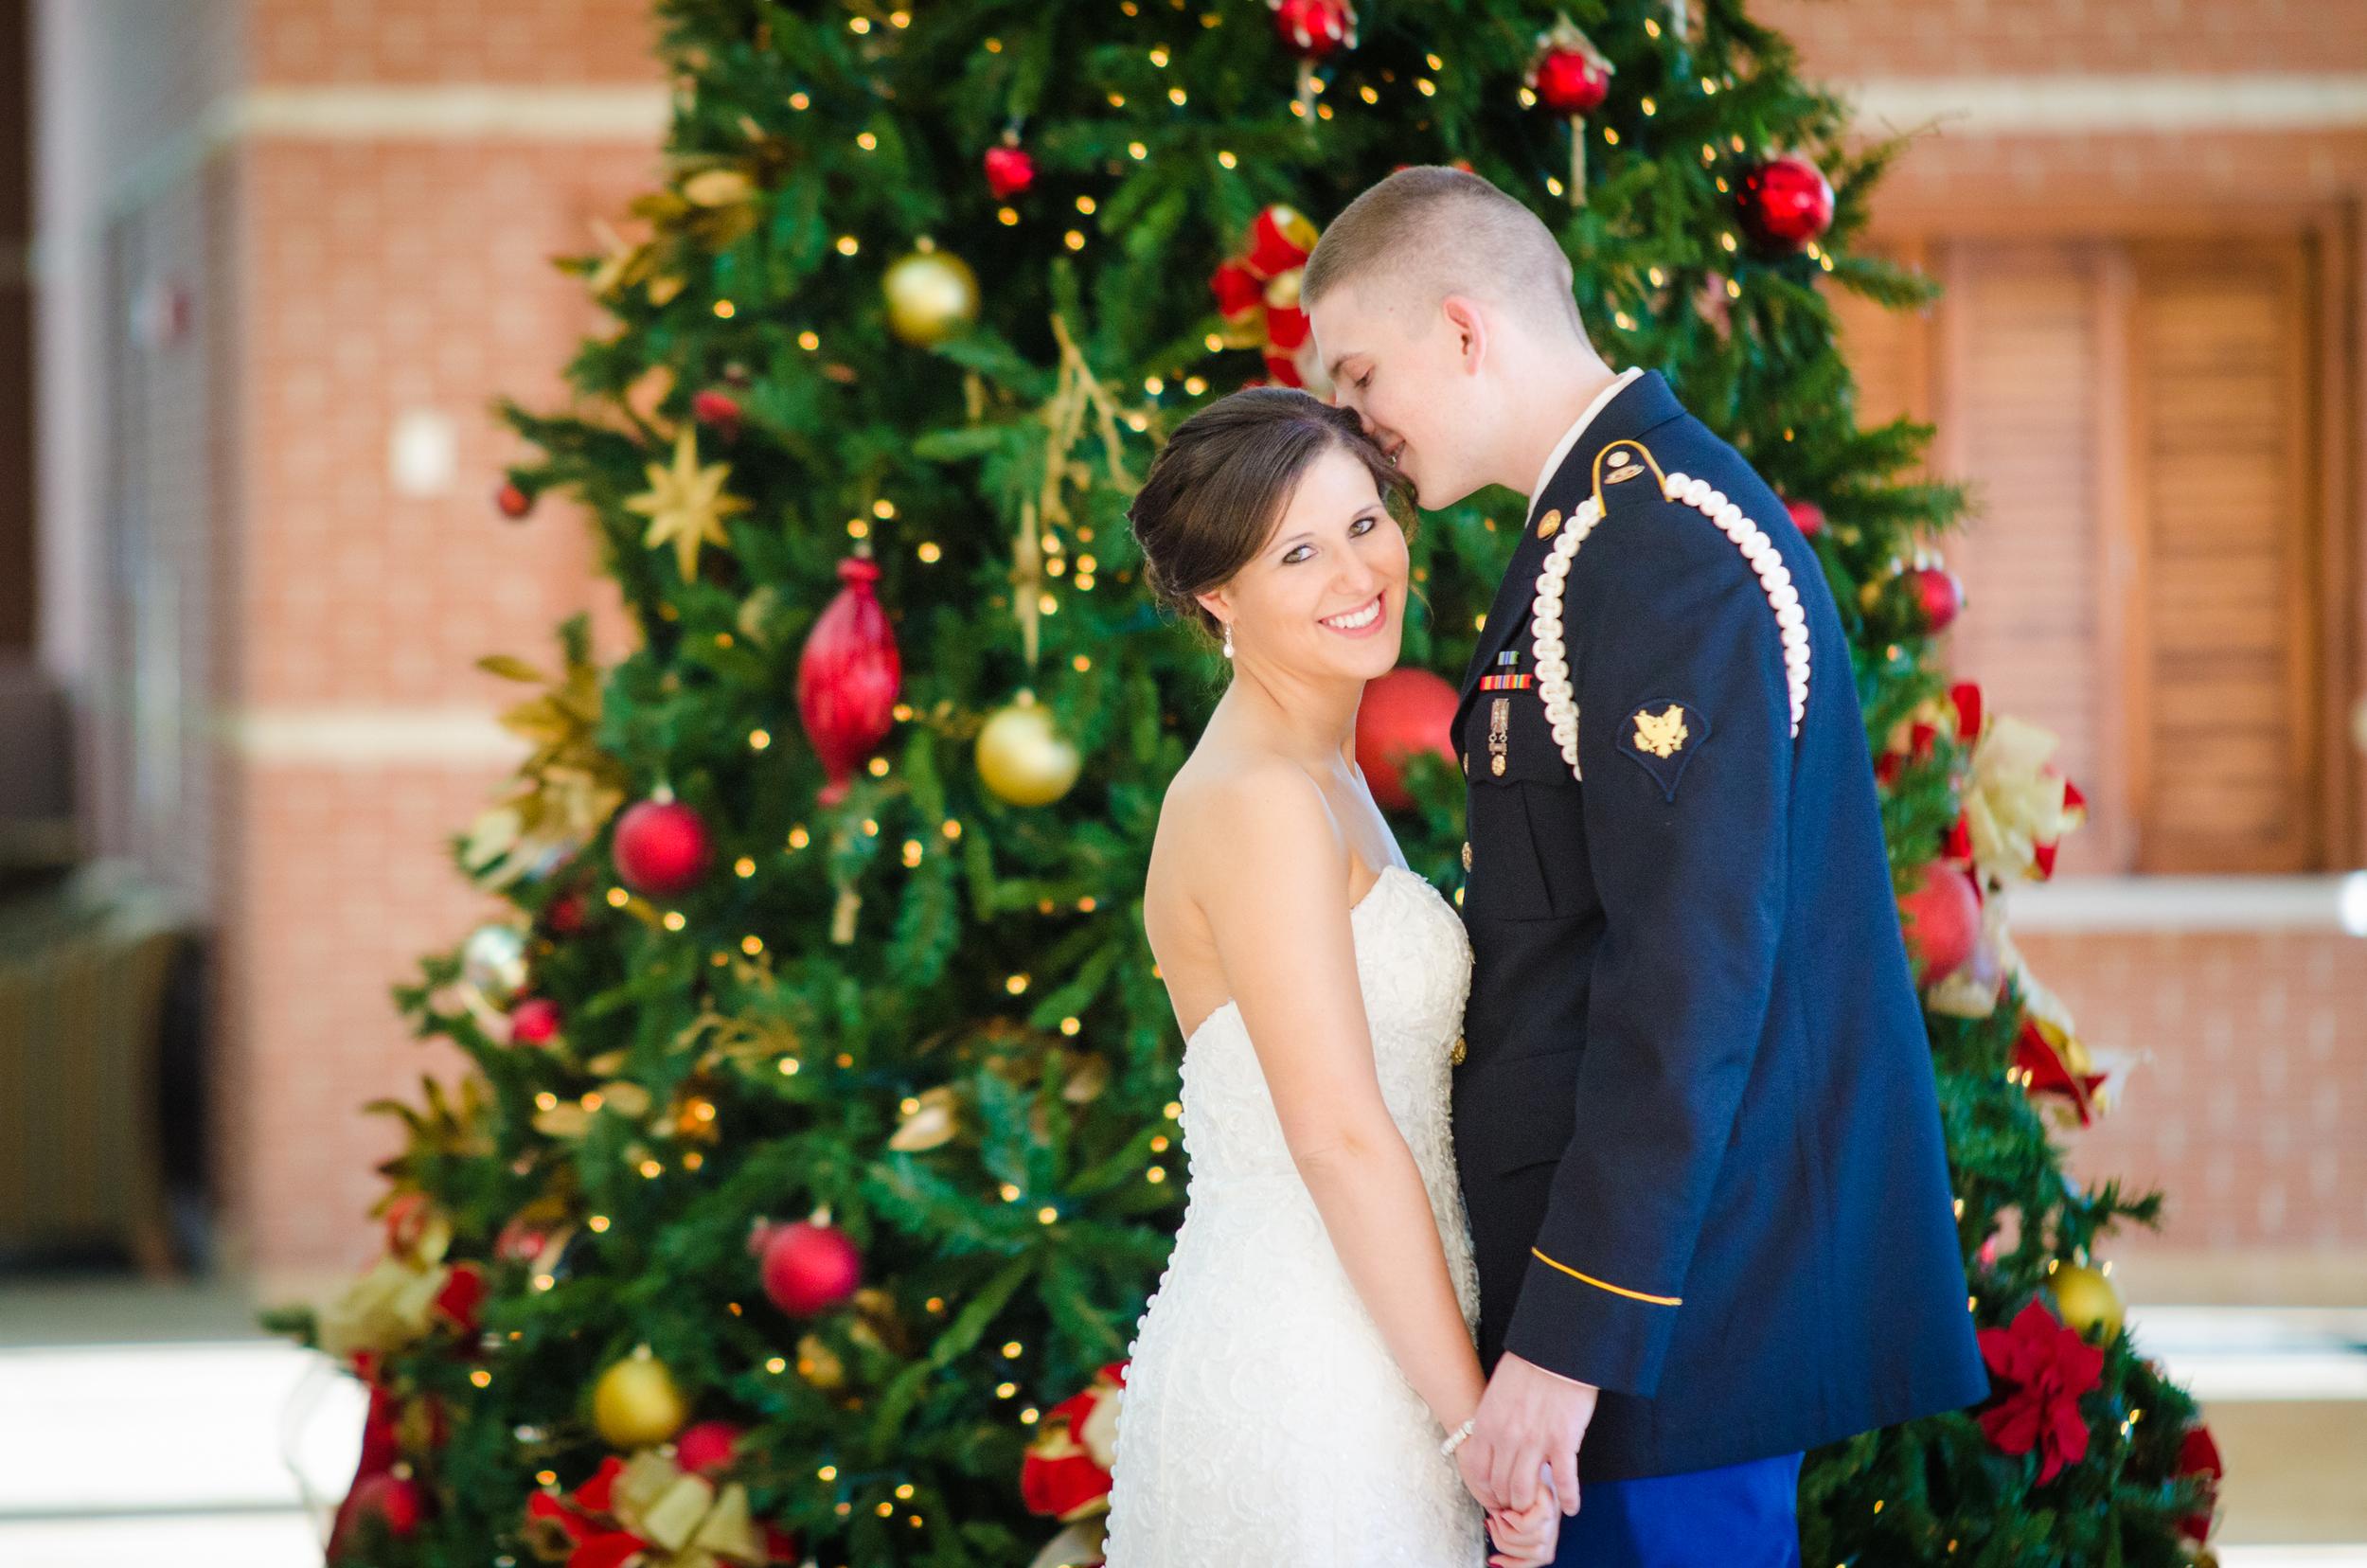 kaitlyn_zackl_wedding_bowling_green_wedding_photography-7495.jpg